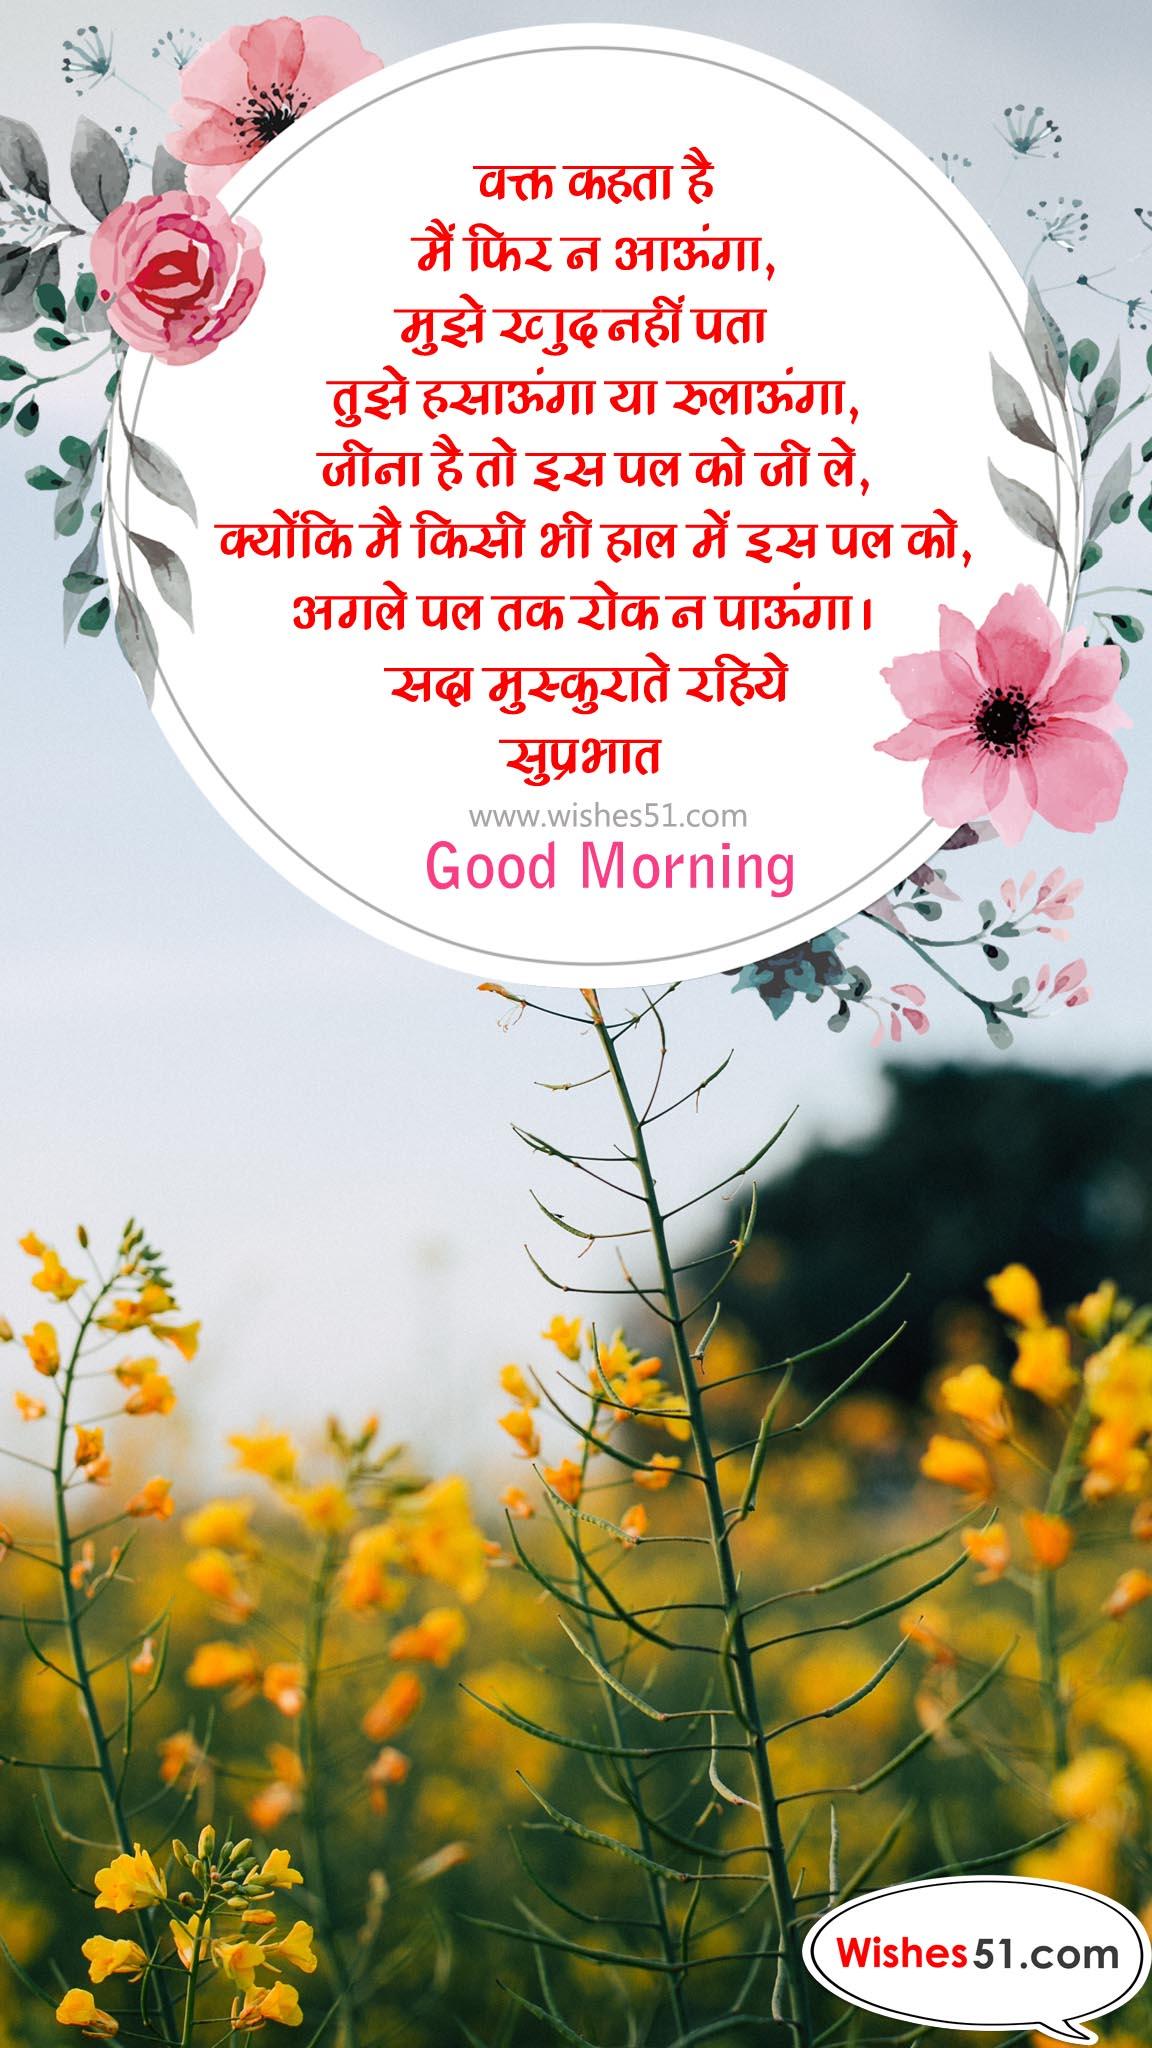 Good Morning Greeting In Hindi Gallery Greetings Card